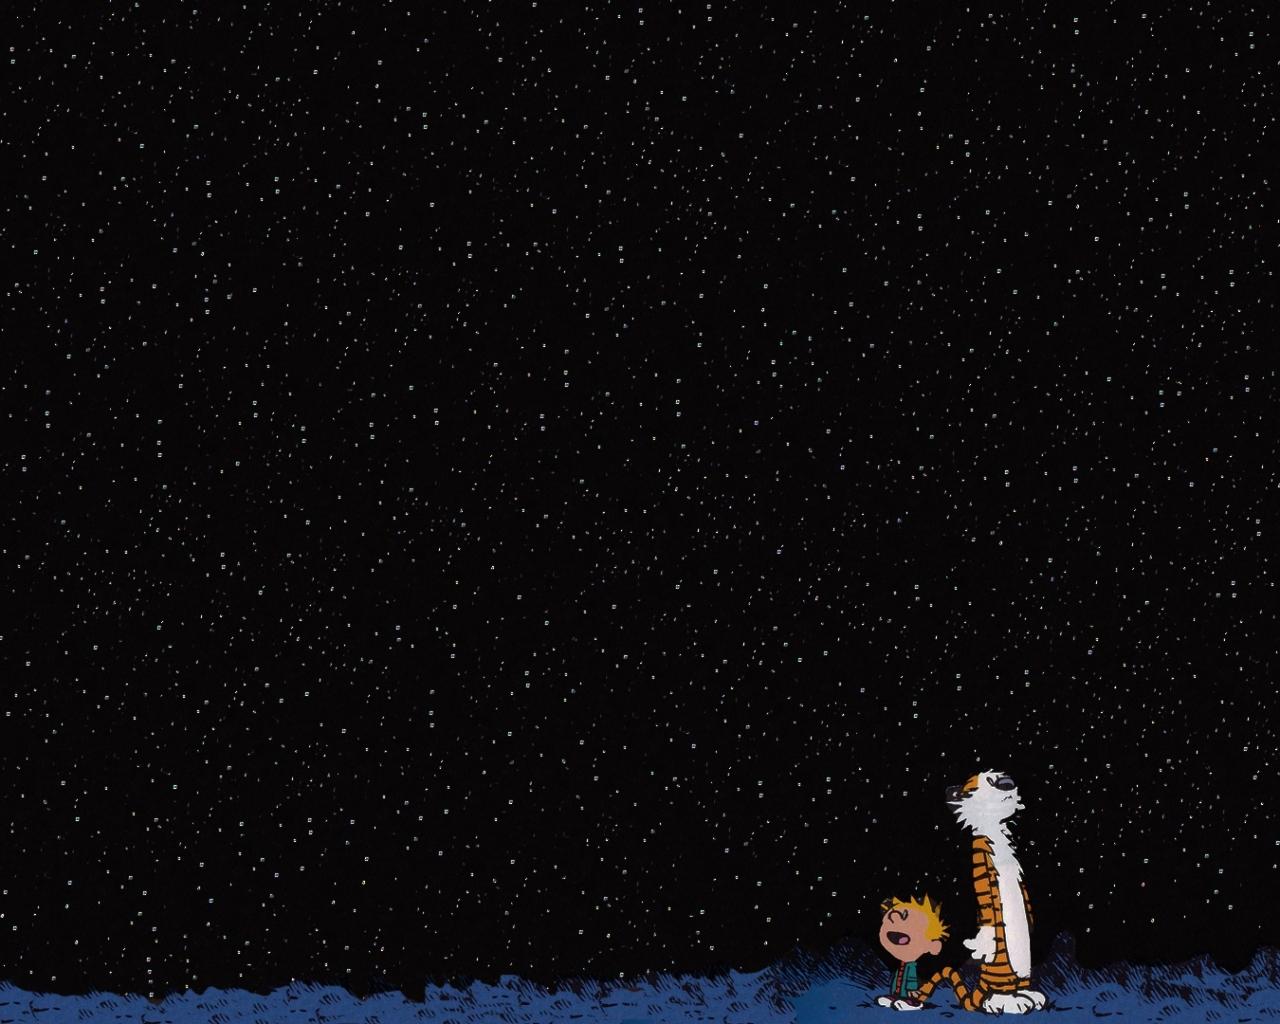 46 Calvin And Hobbes Stars Wallpaper On Wallpapersafari